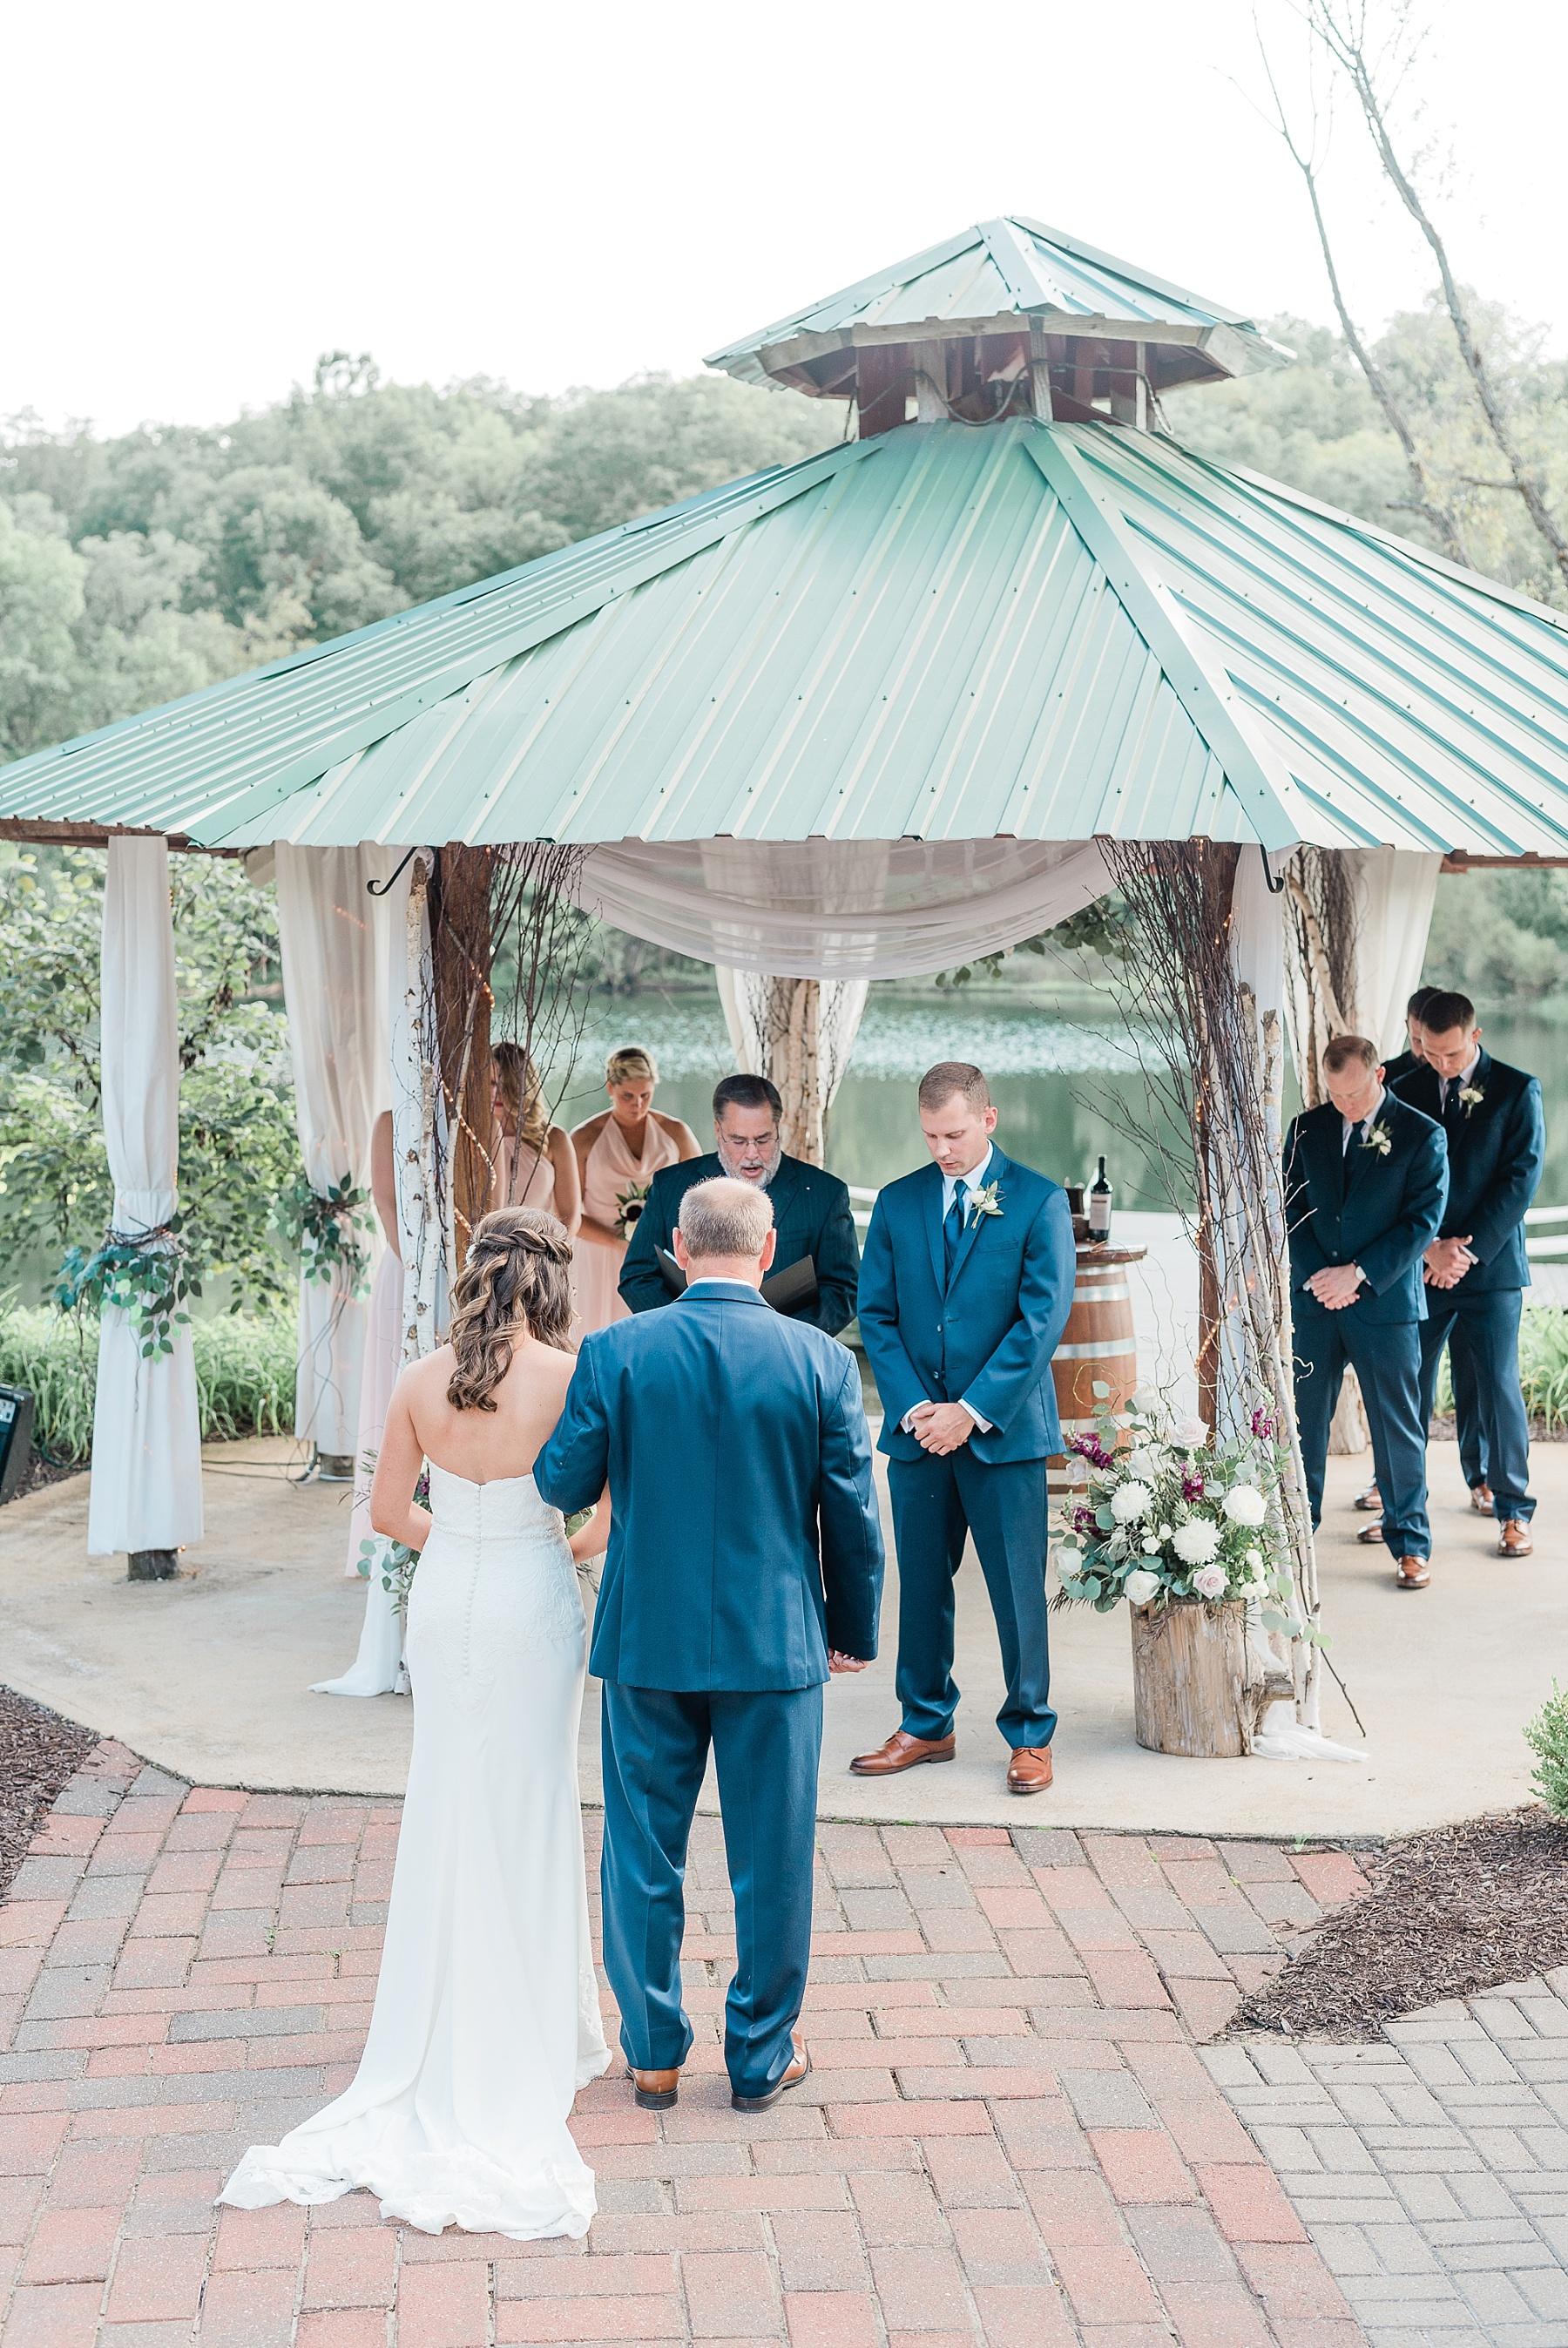 Romantic Summer Sunset Wedding Ceremony at Little Piney Lodge St. Louis Missouri by Kelsi Kliethermes Photography Fine Art Photographer_0054.jpg